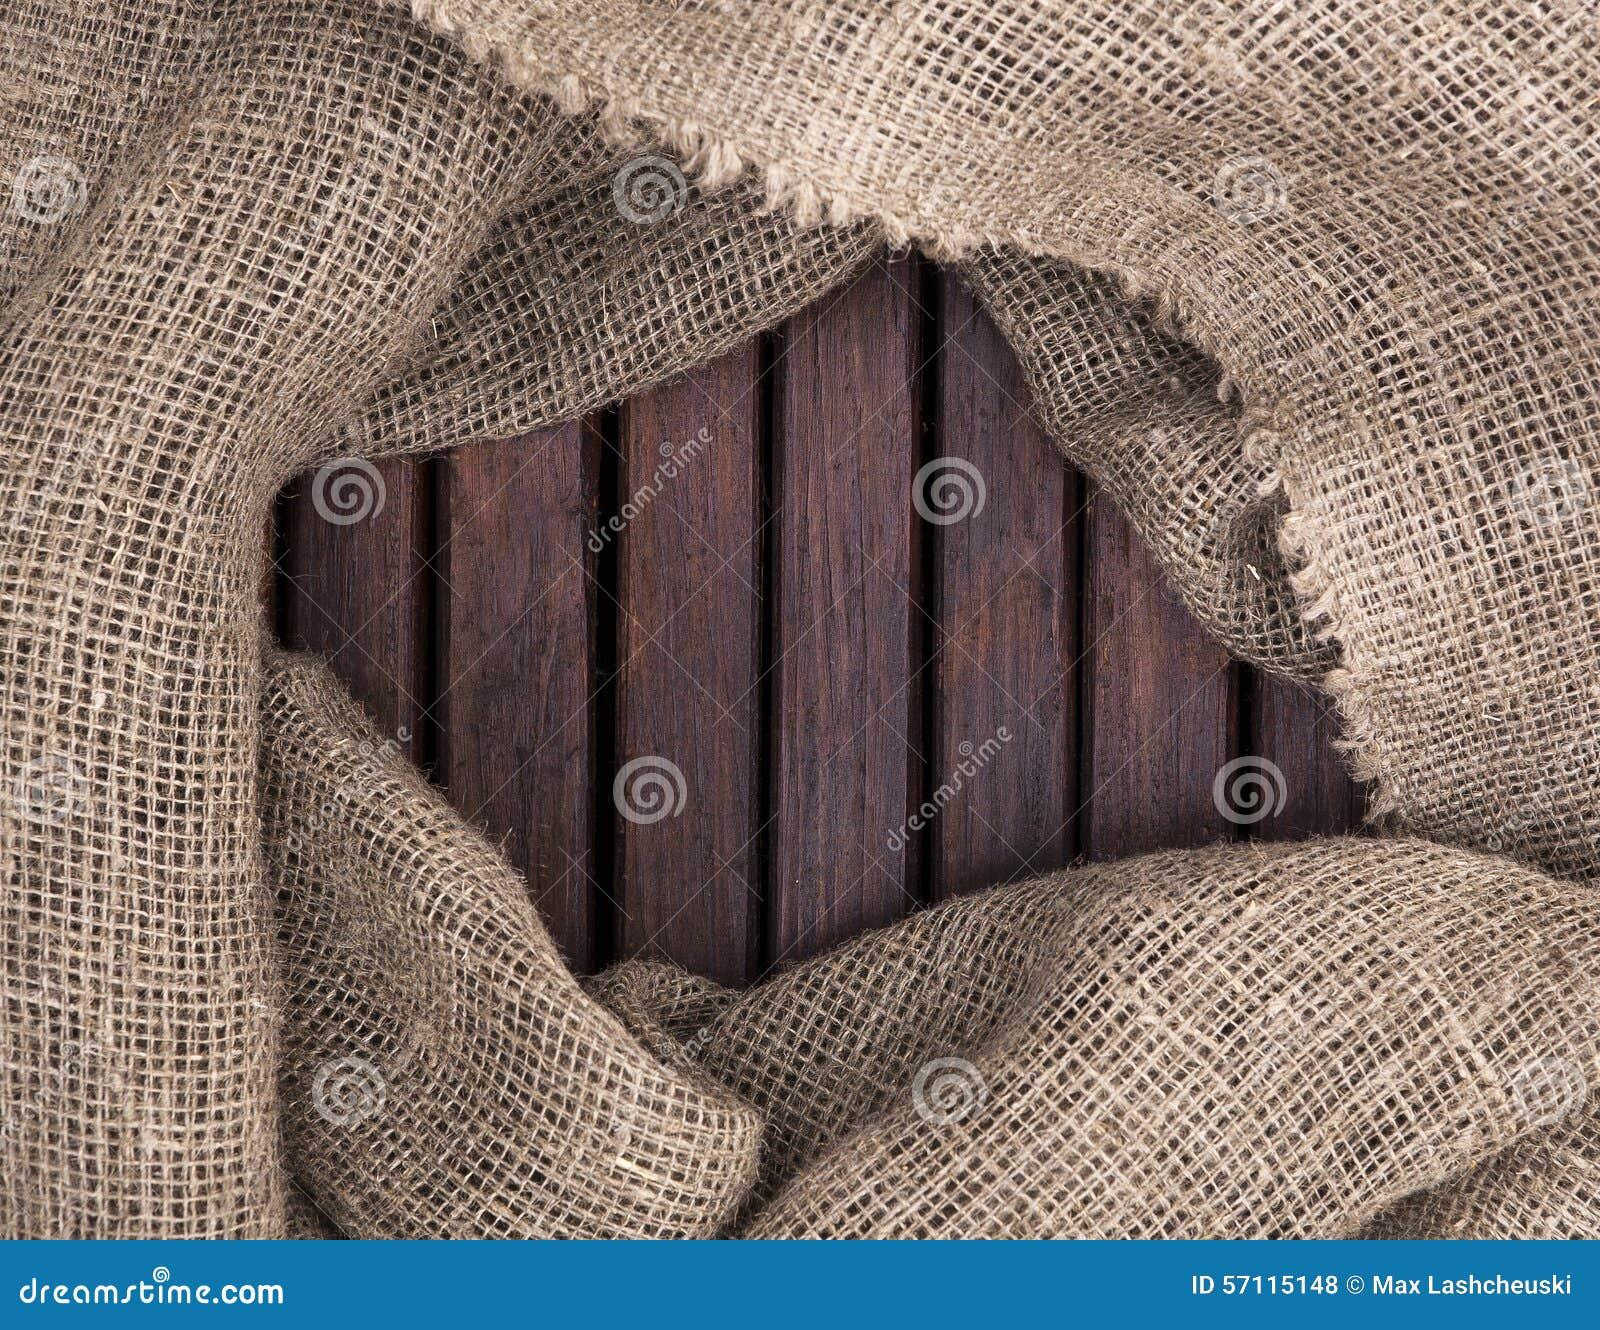 Wood texture. Frame textiles.